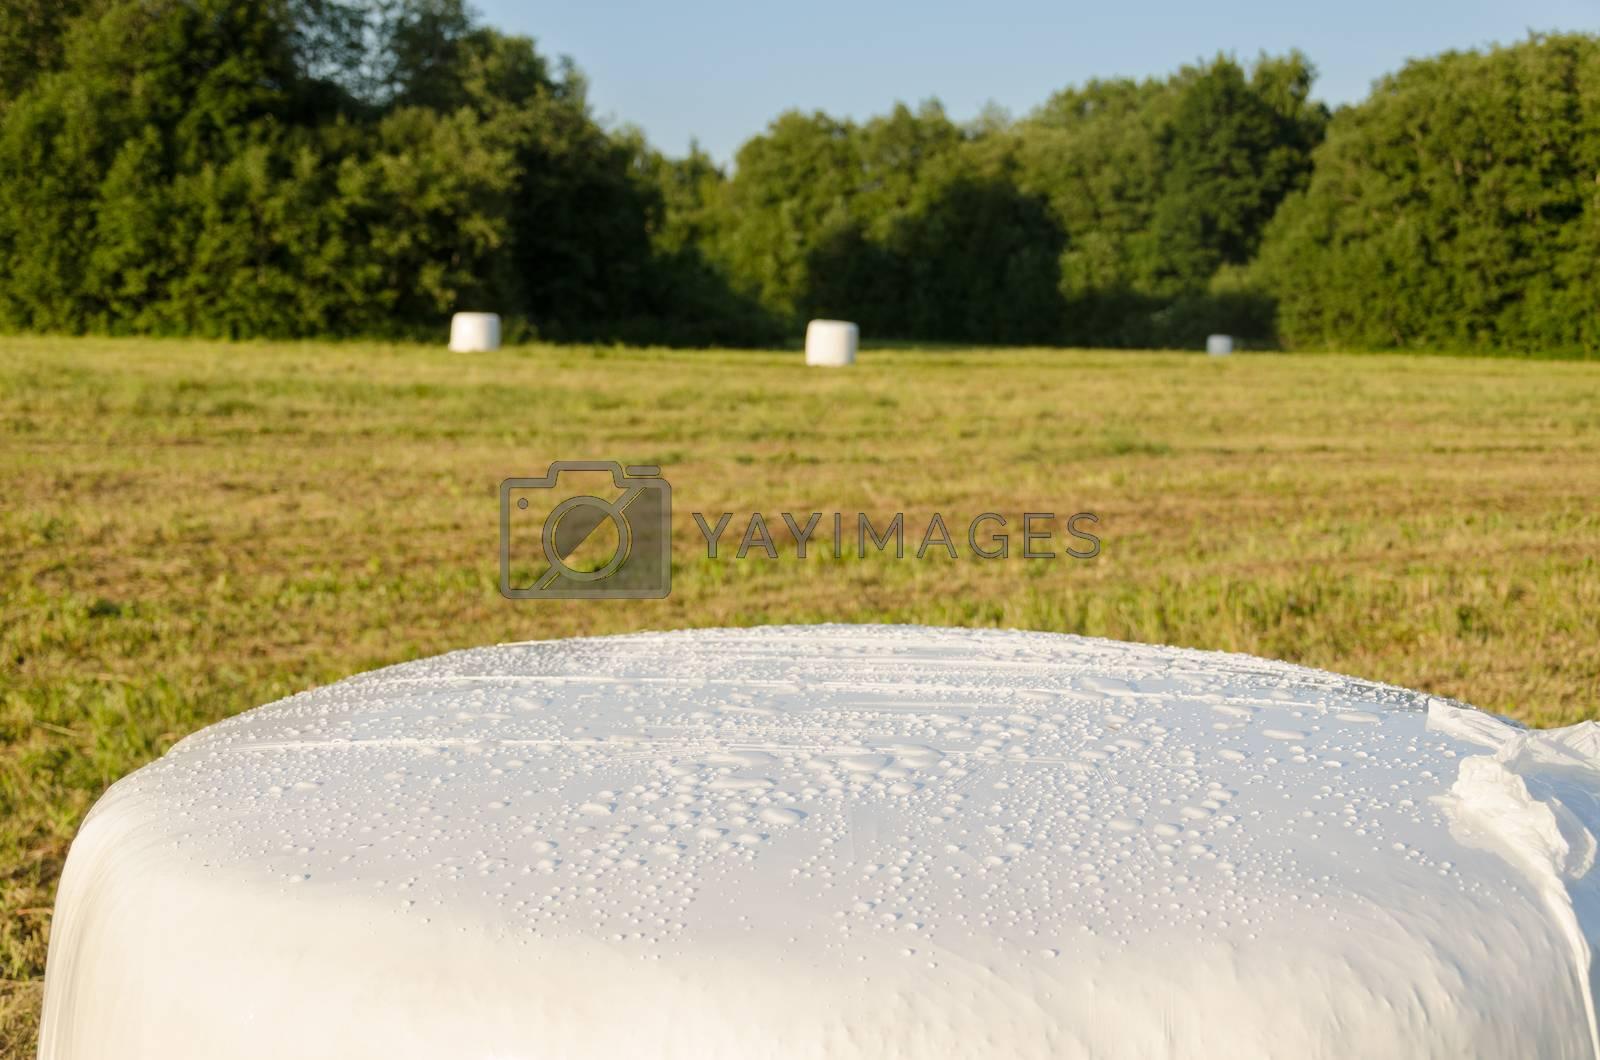 polythene wrapped grass straw bales. Animal fodder  by sauletas